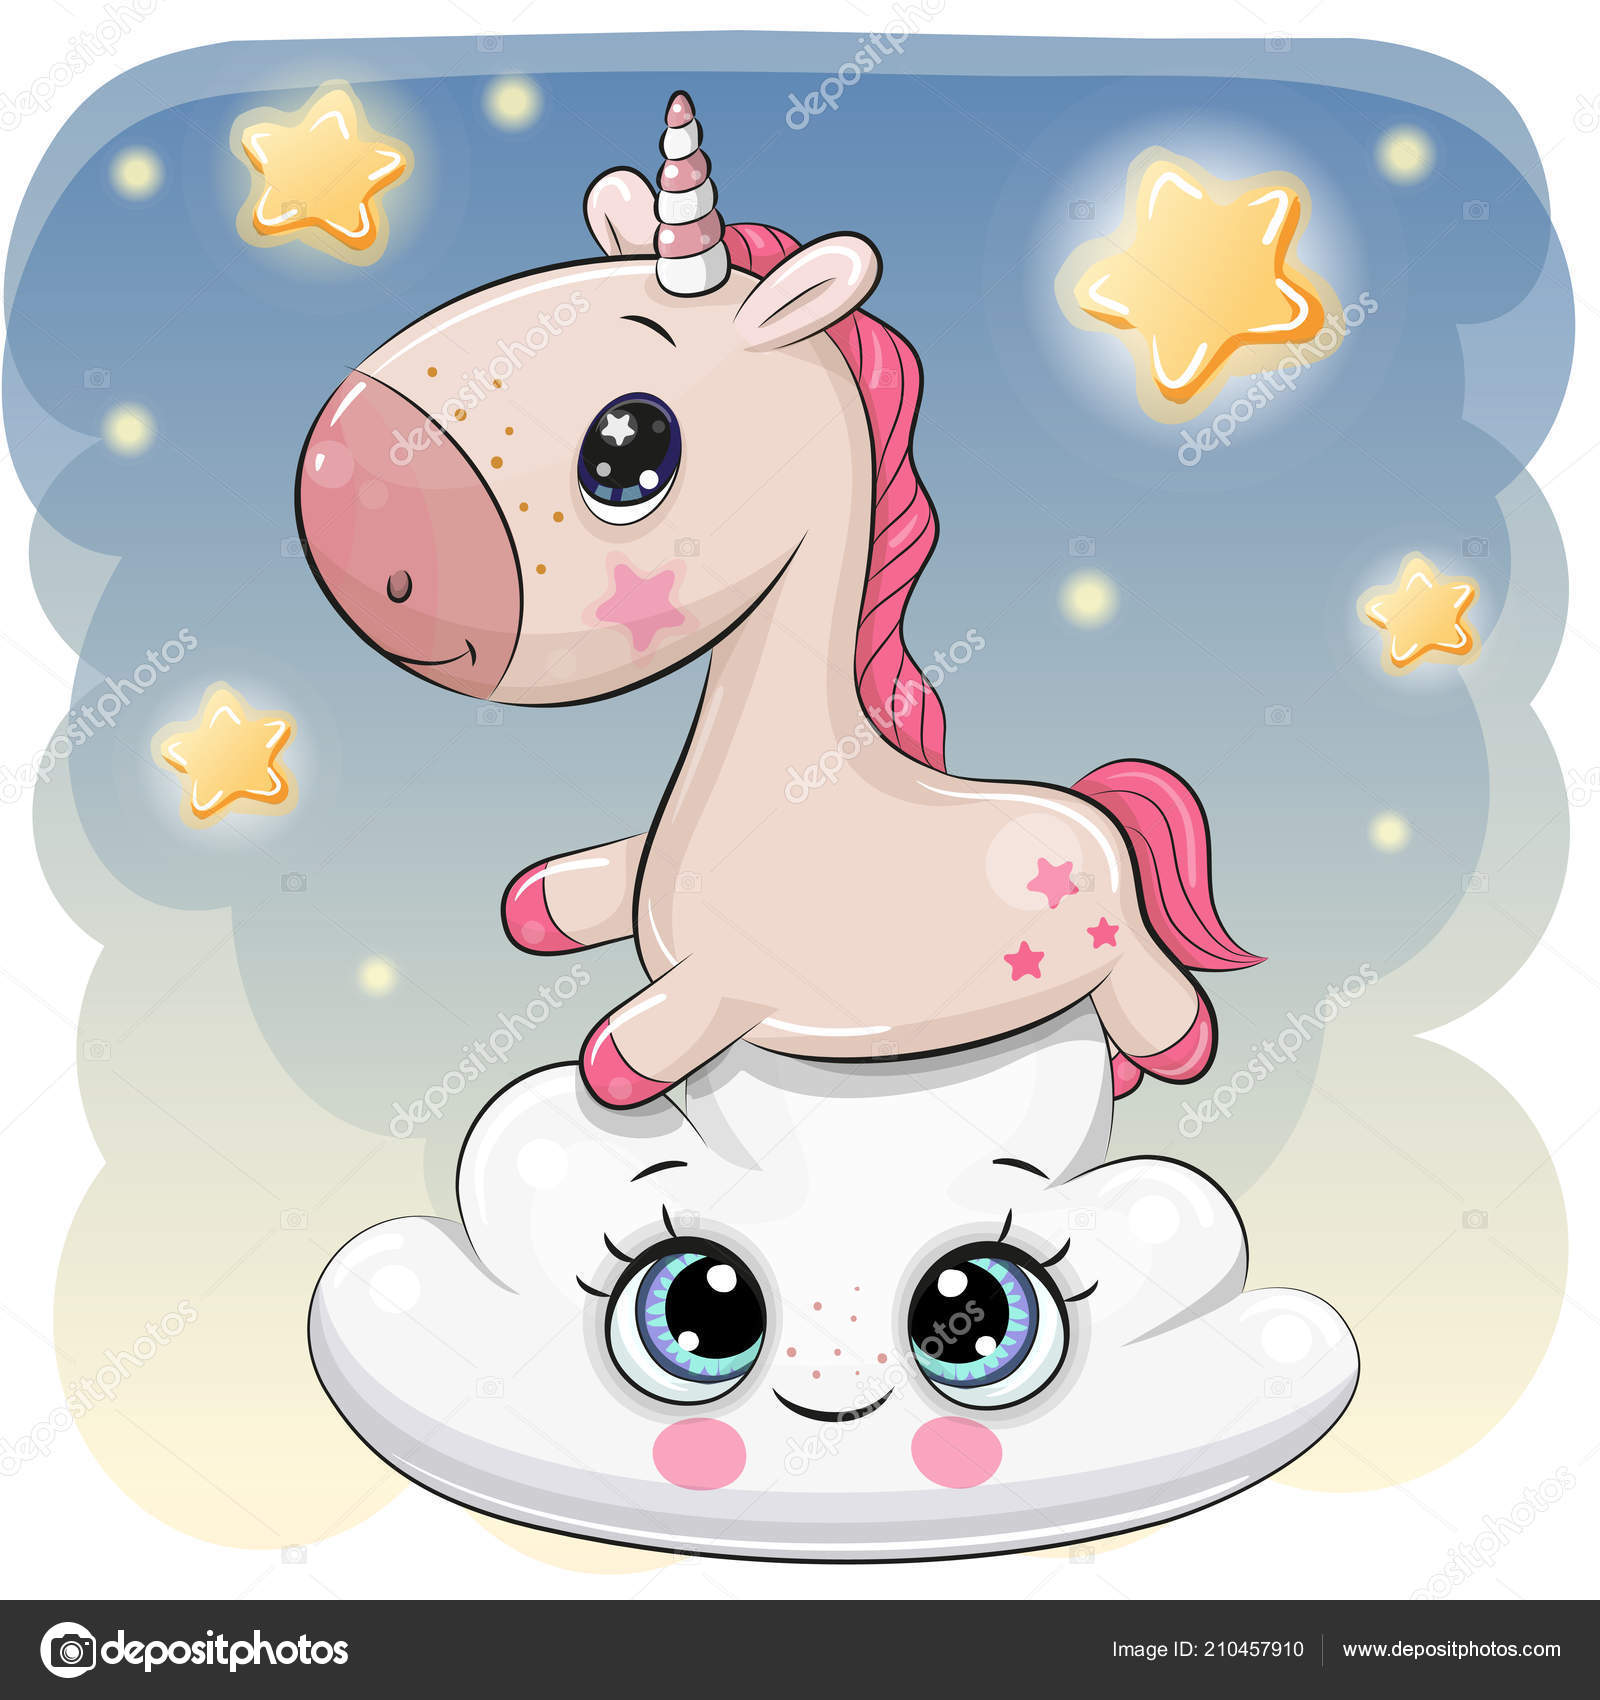 cute unicorn cartoon - HD1600×1700